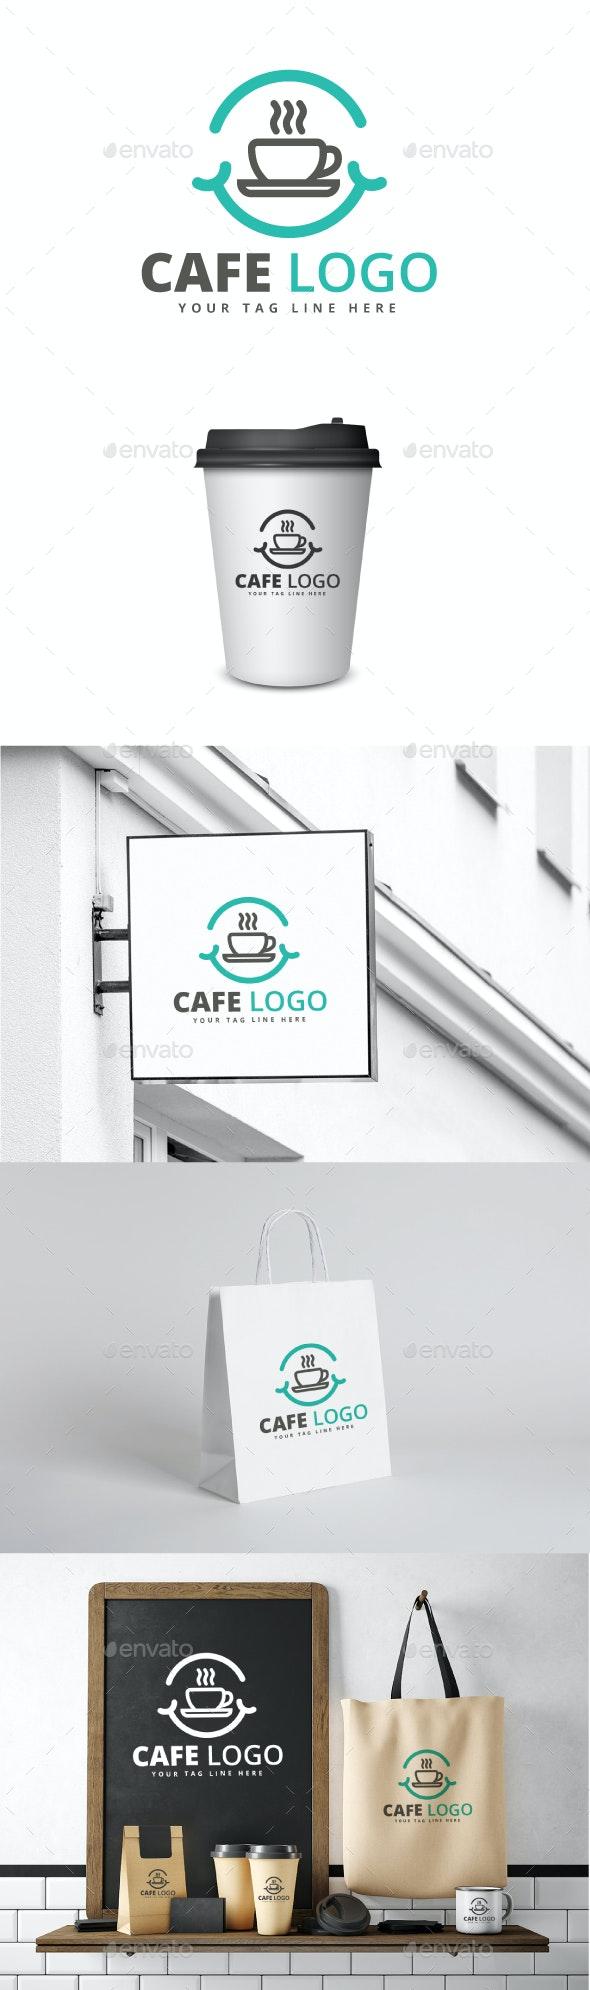 Cafe and Coffee Logo Design - Food Logo Templates